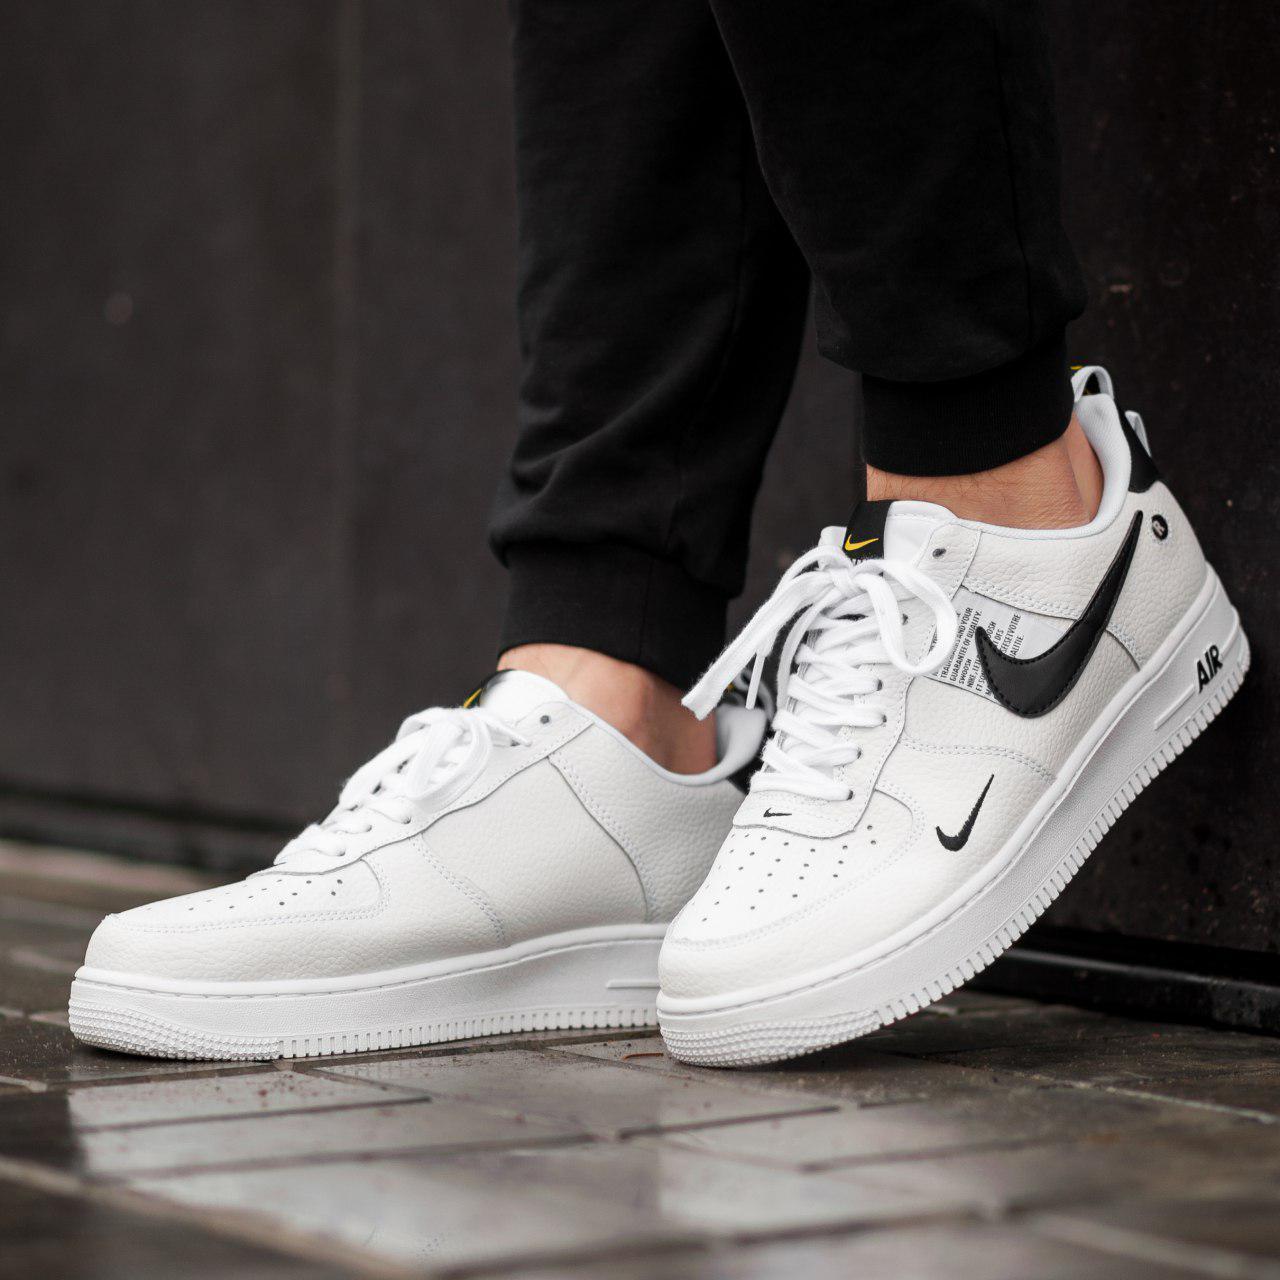 lowest price 3bb76 48726 Кроссовки мужские в стиле Nike Air Force LV8 Utility White (Реплика ААА+)